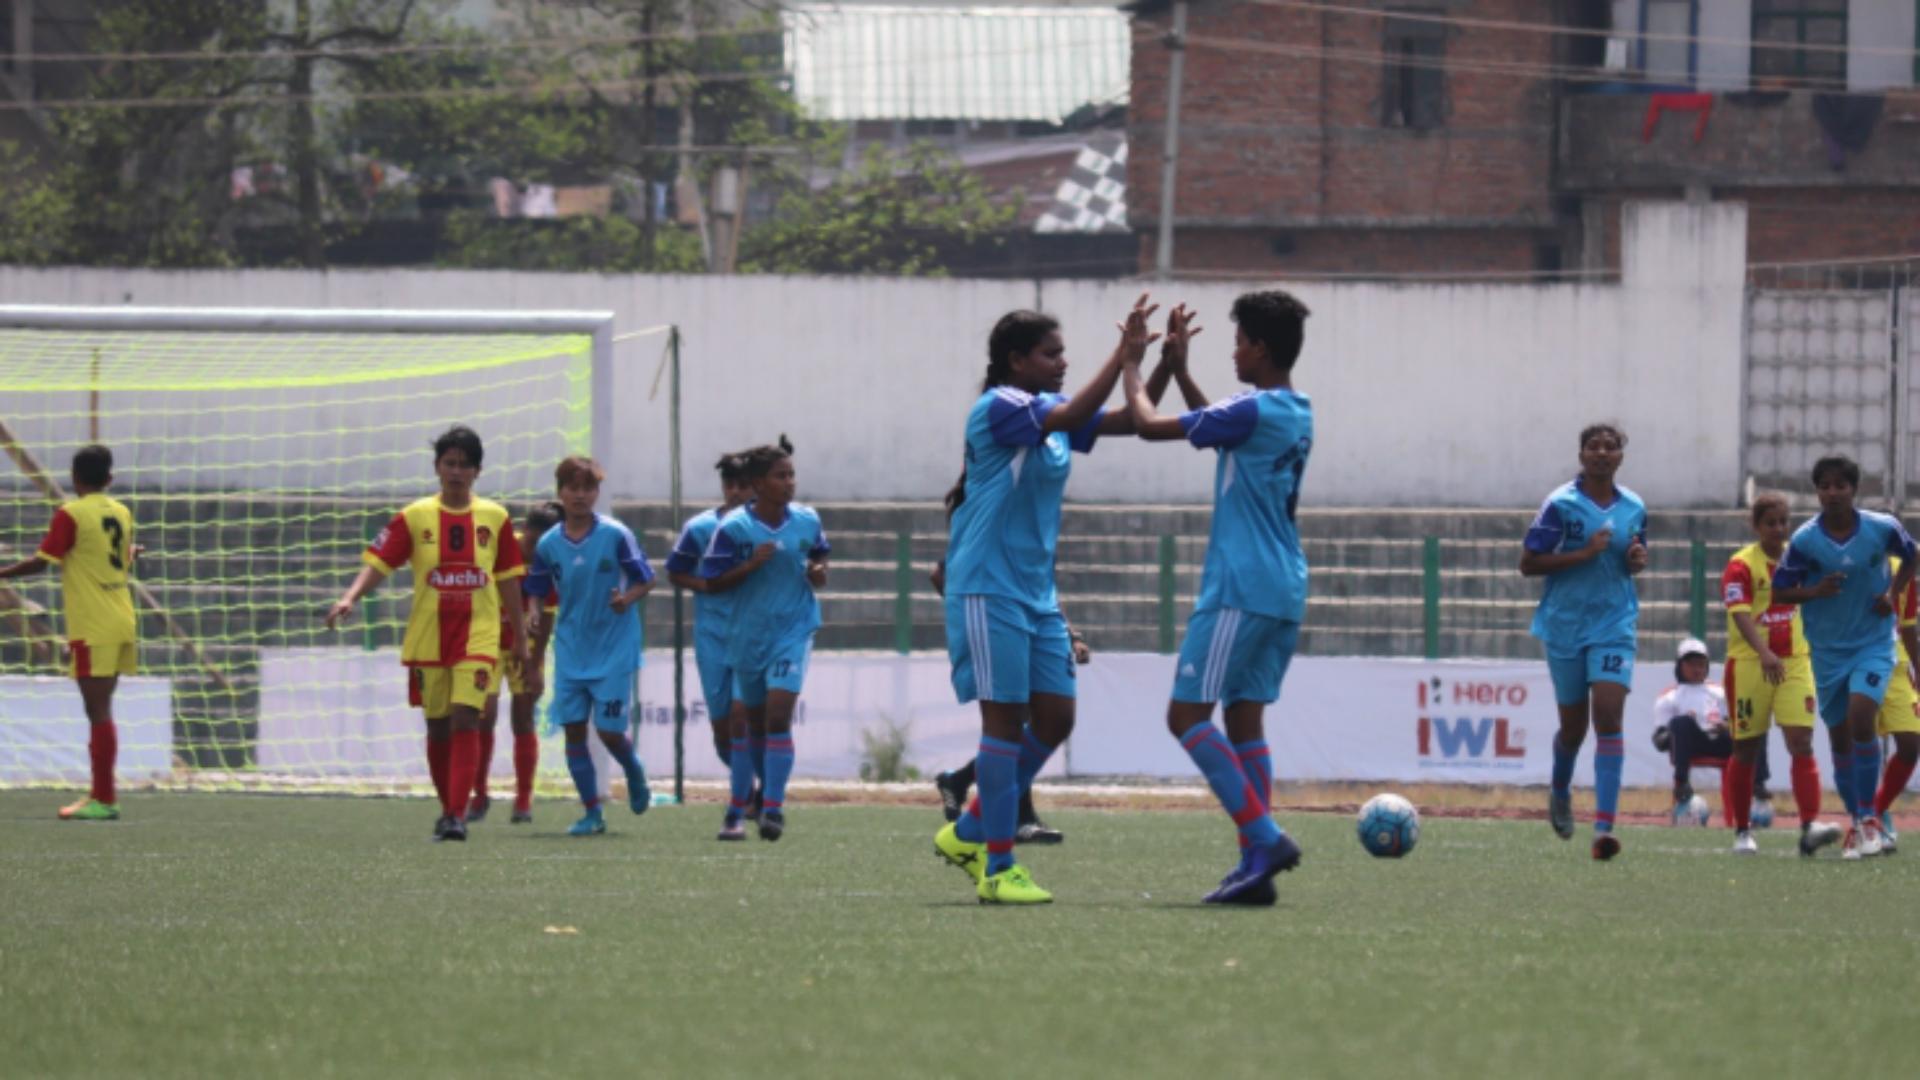 Rising Student's Club Gokulam Kerala IWL 2017-18